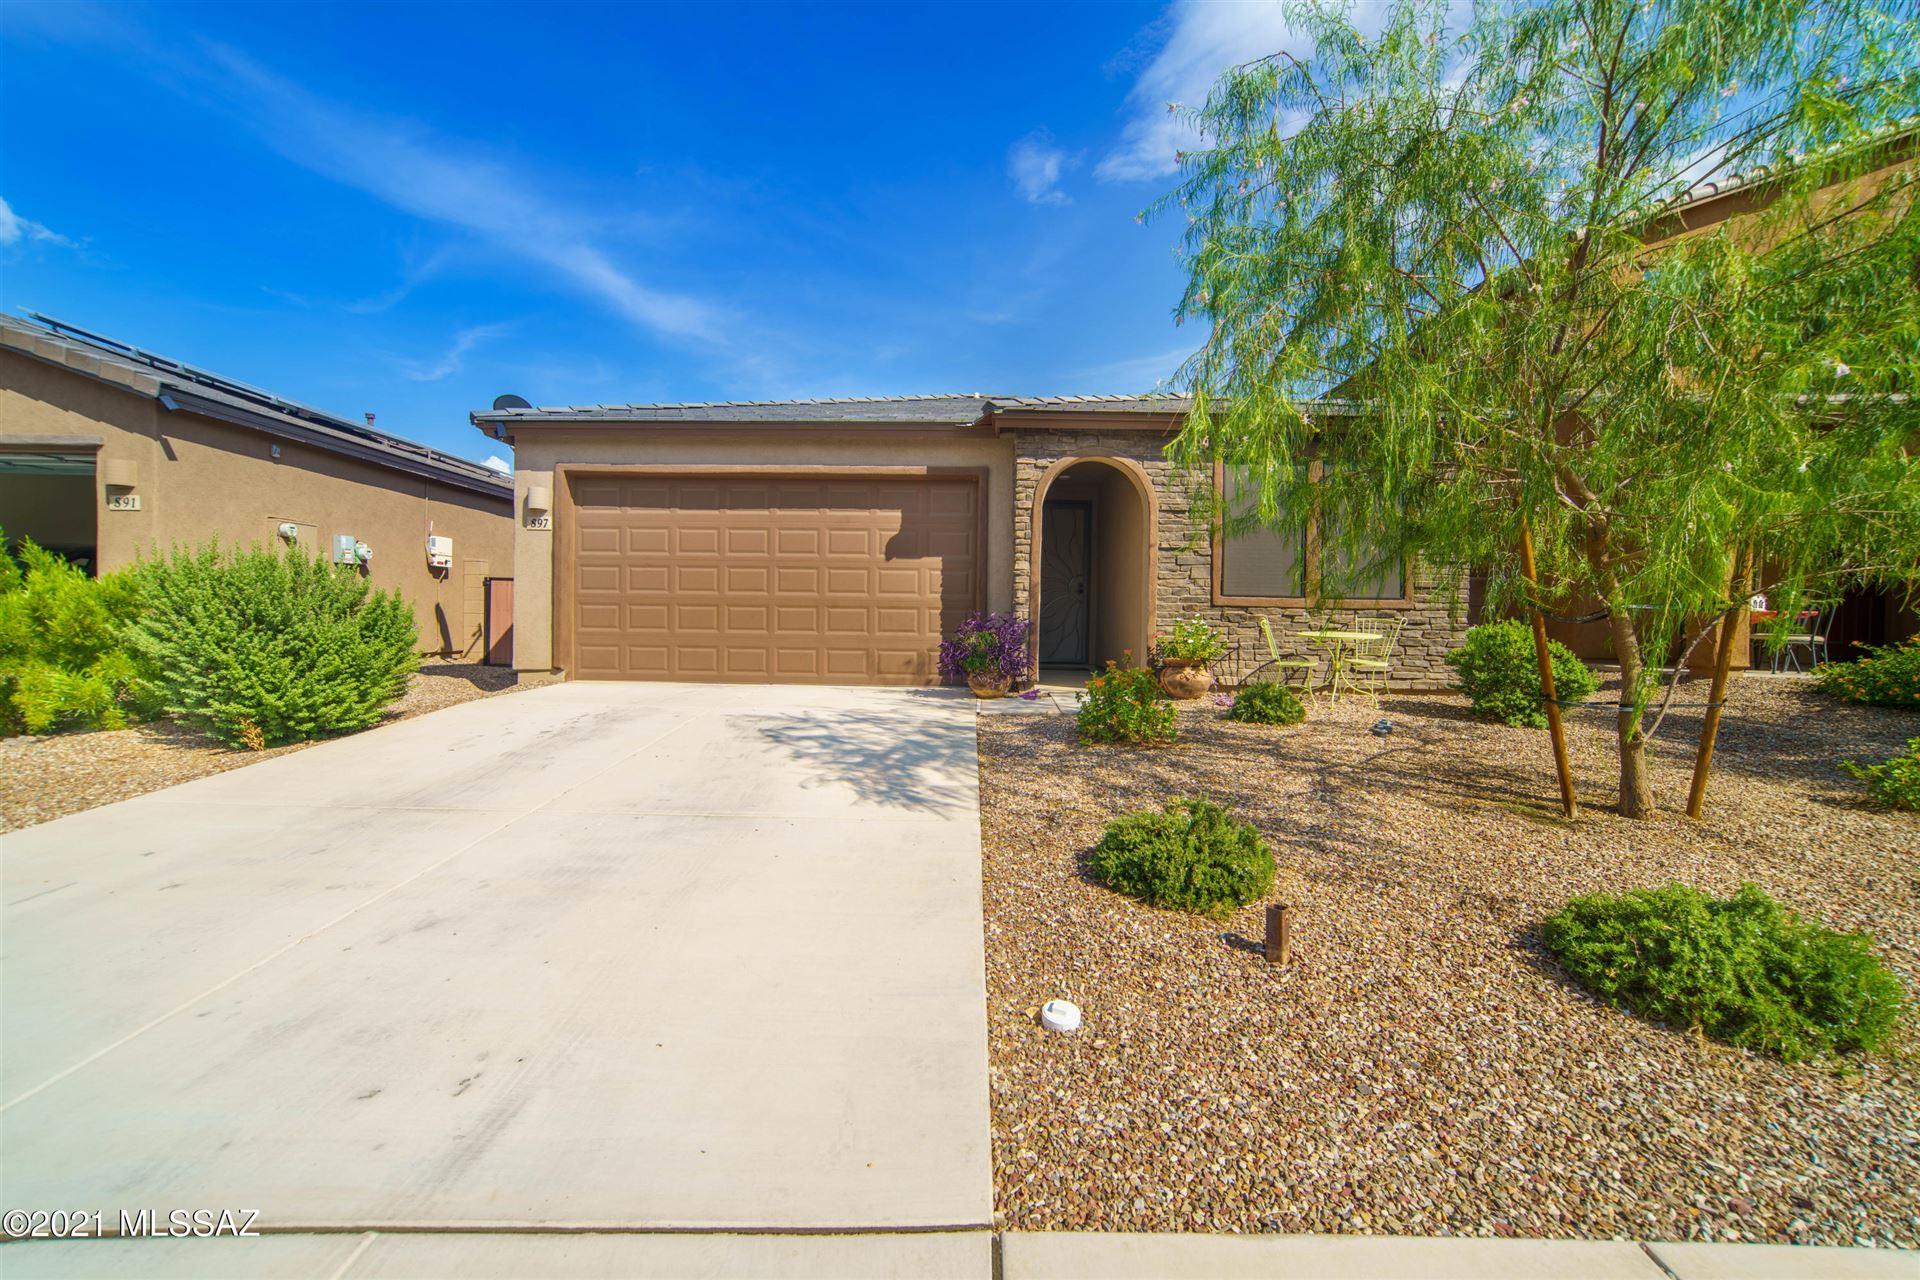 897 W Calle Tipoy, Sahuarita, AZ 85629 - MLS#: 22118921